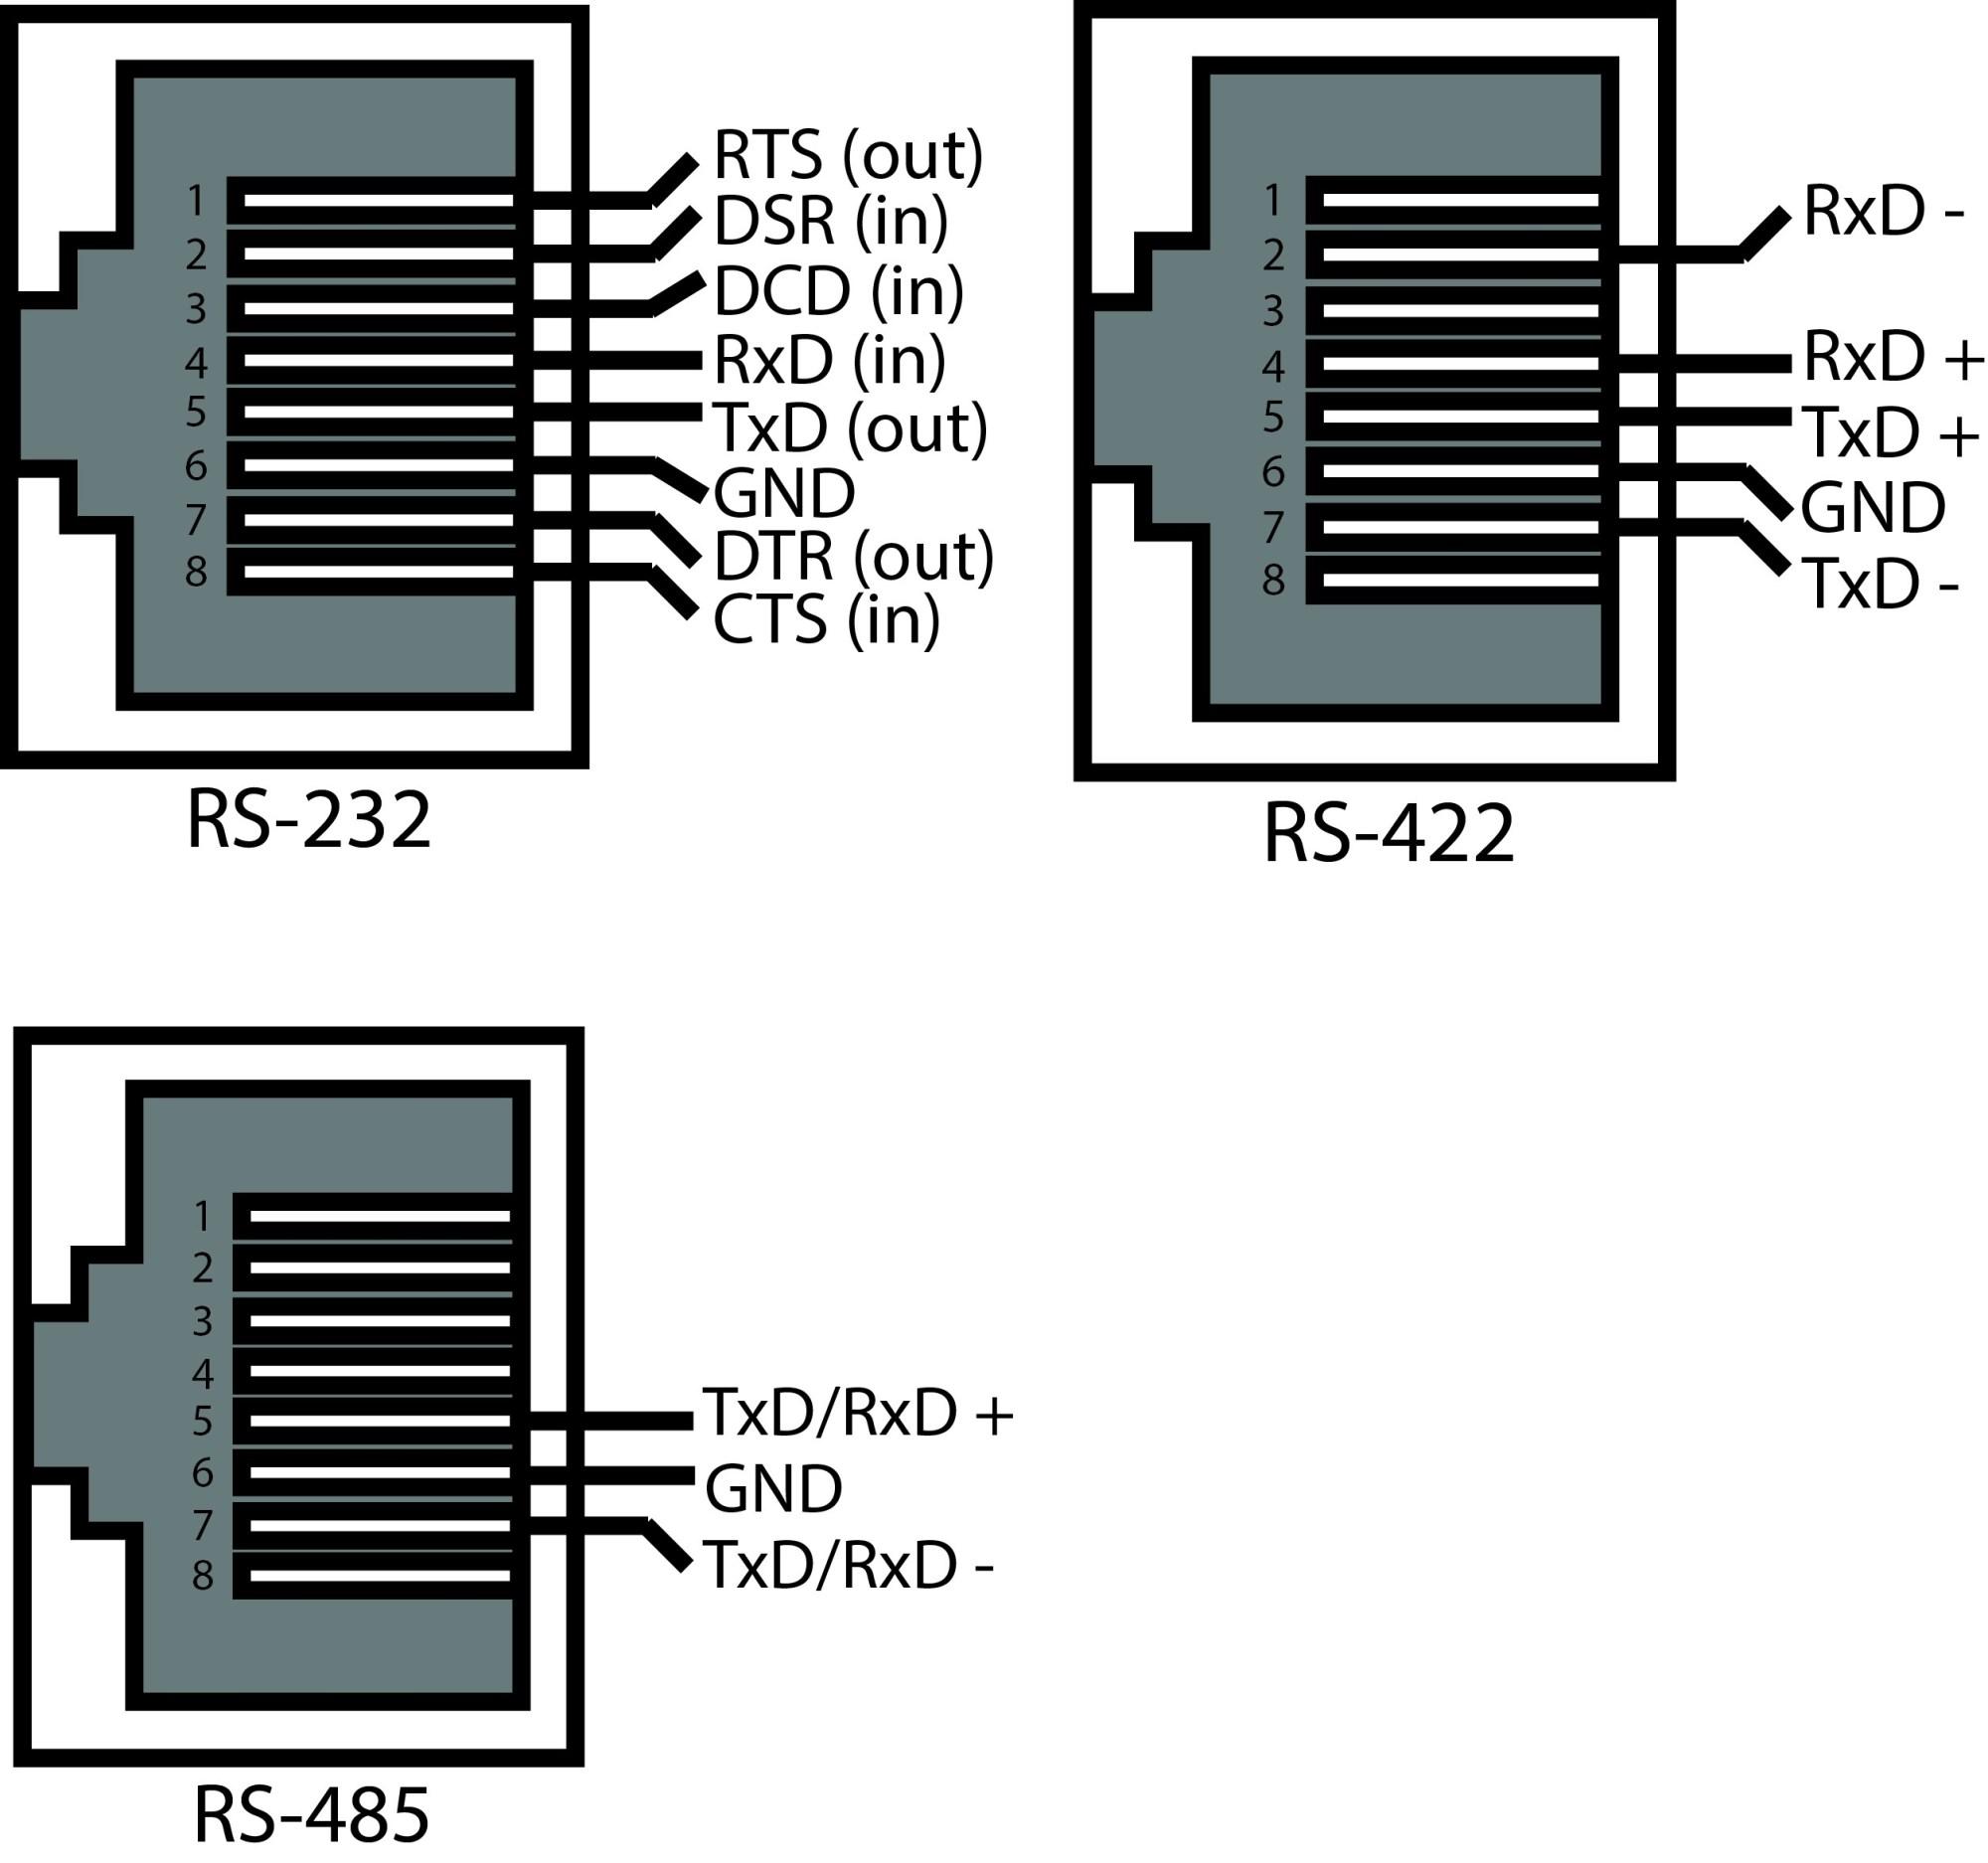 hight resolution of communication modbus db9 wiring wiring diagram communication modbus db9 wiring